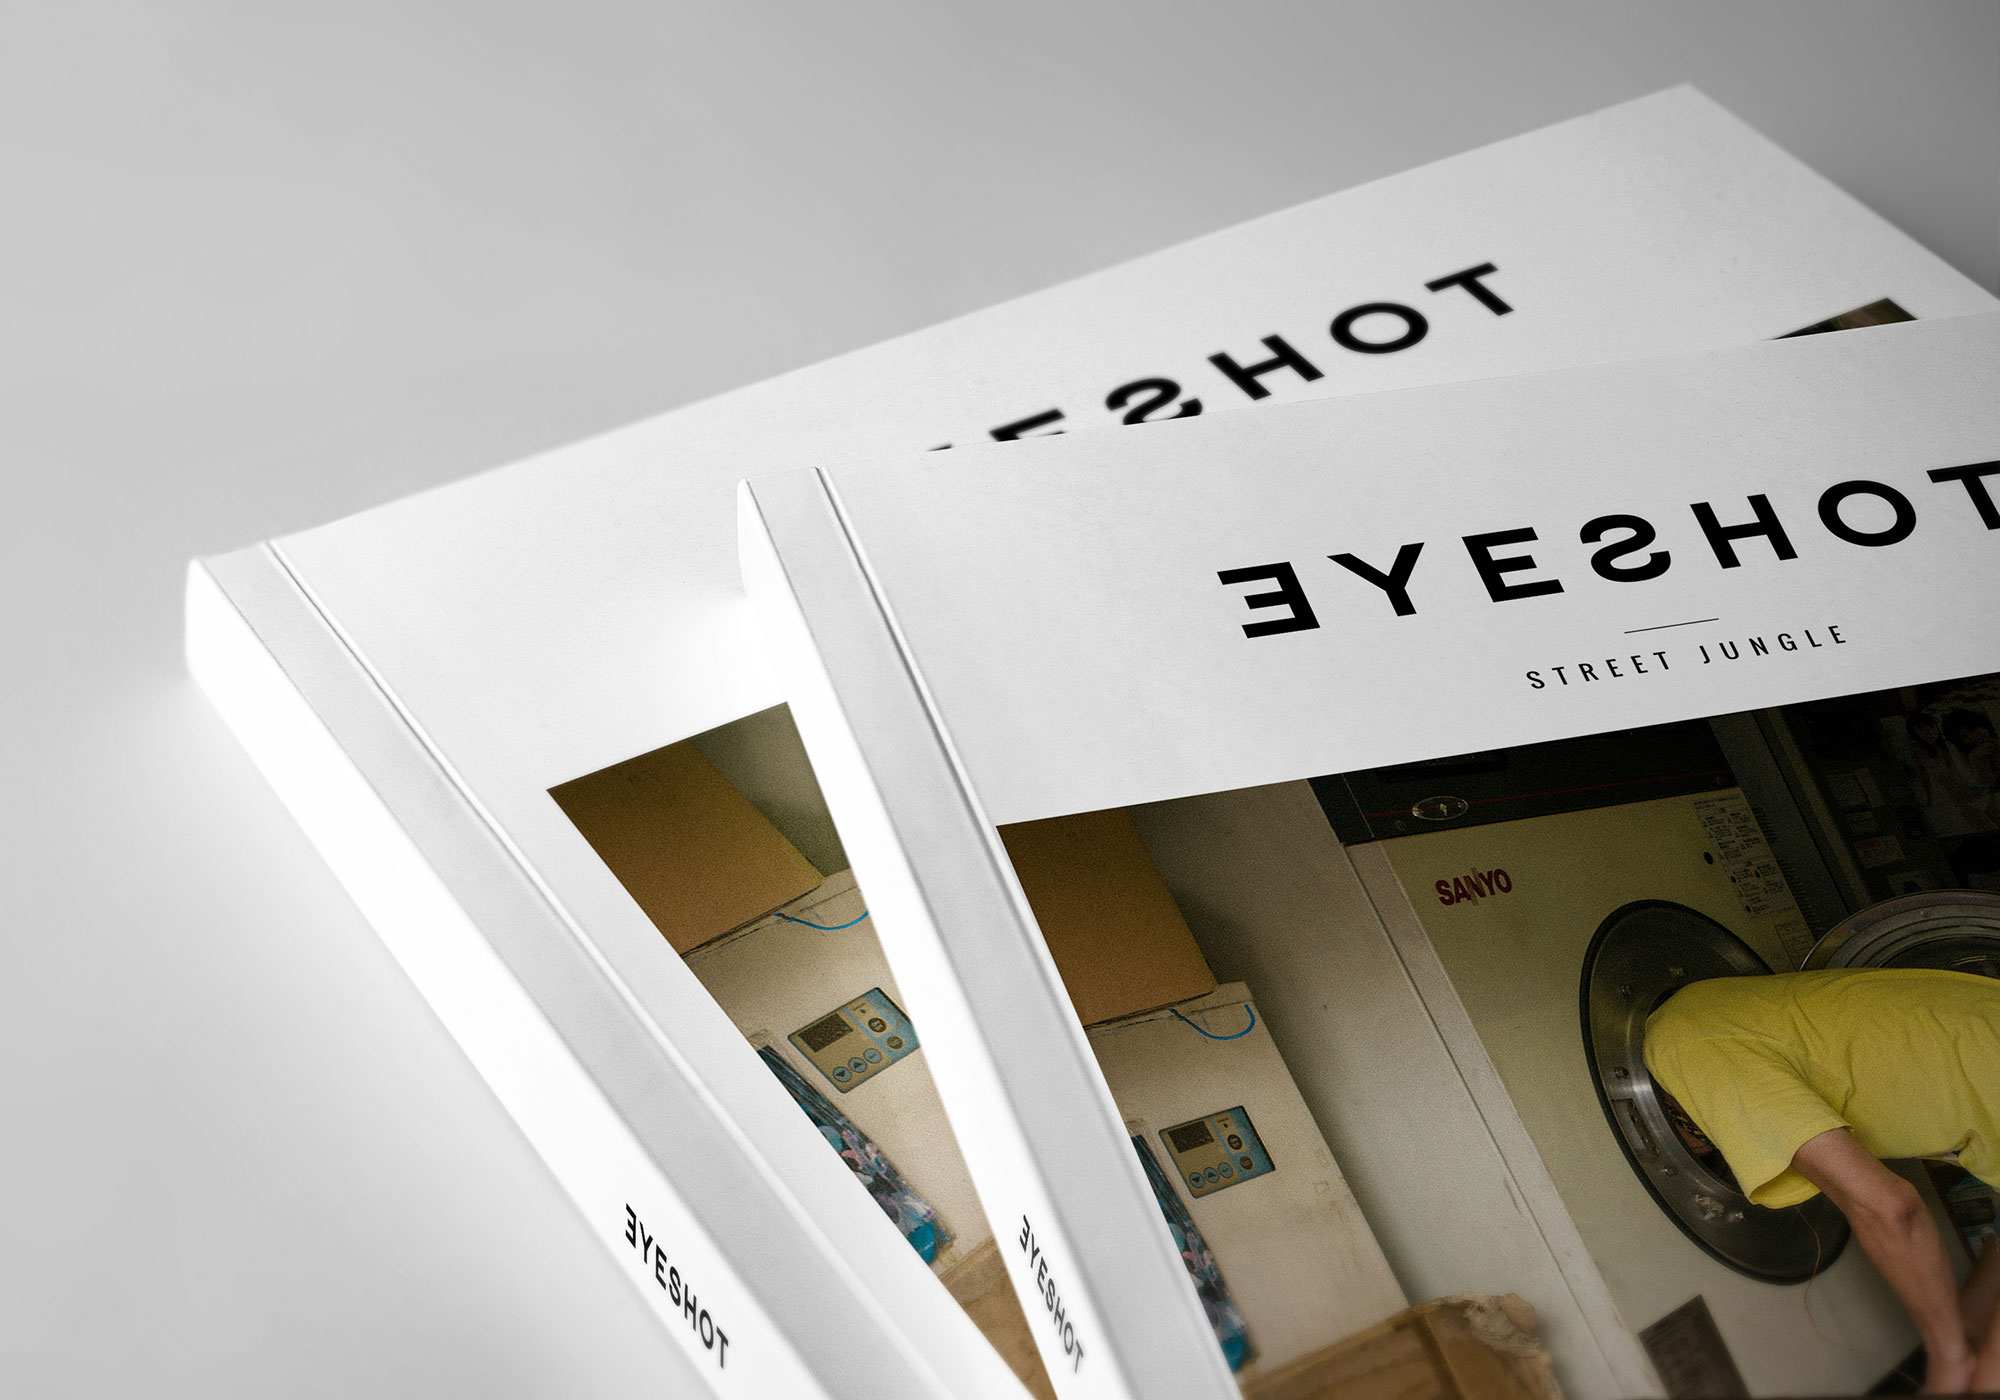 Eyeshot Subscription Plans